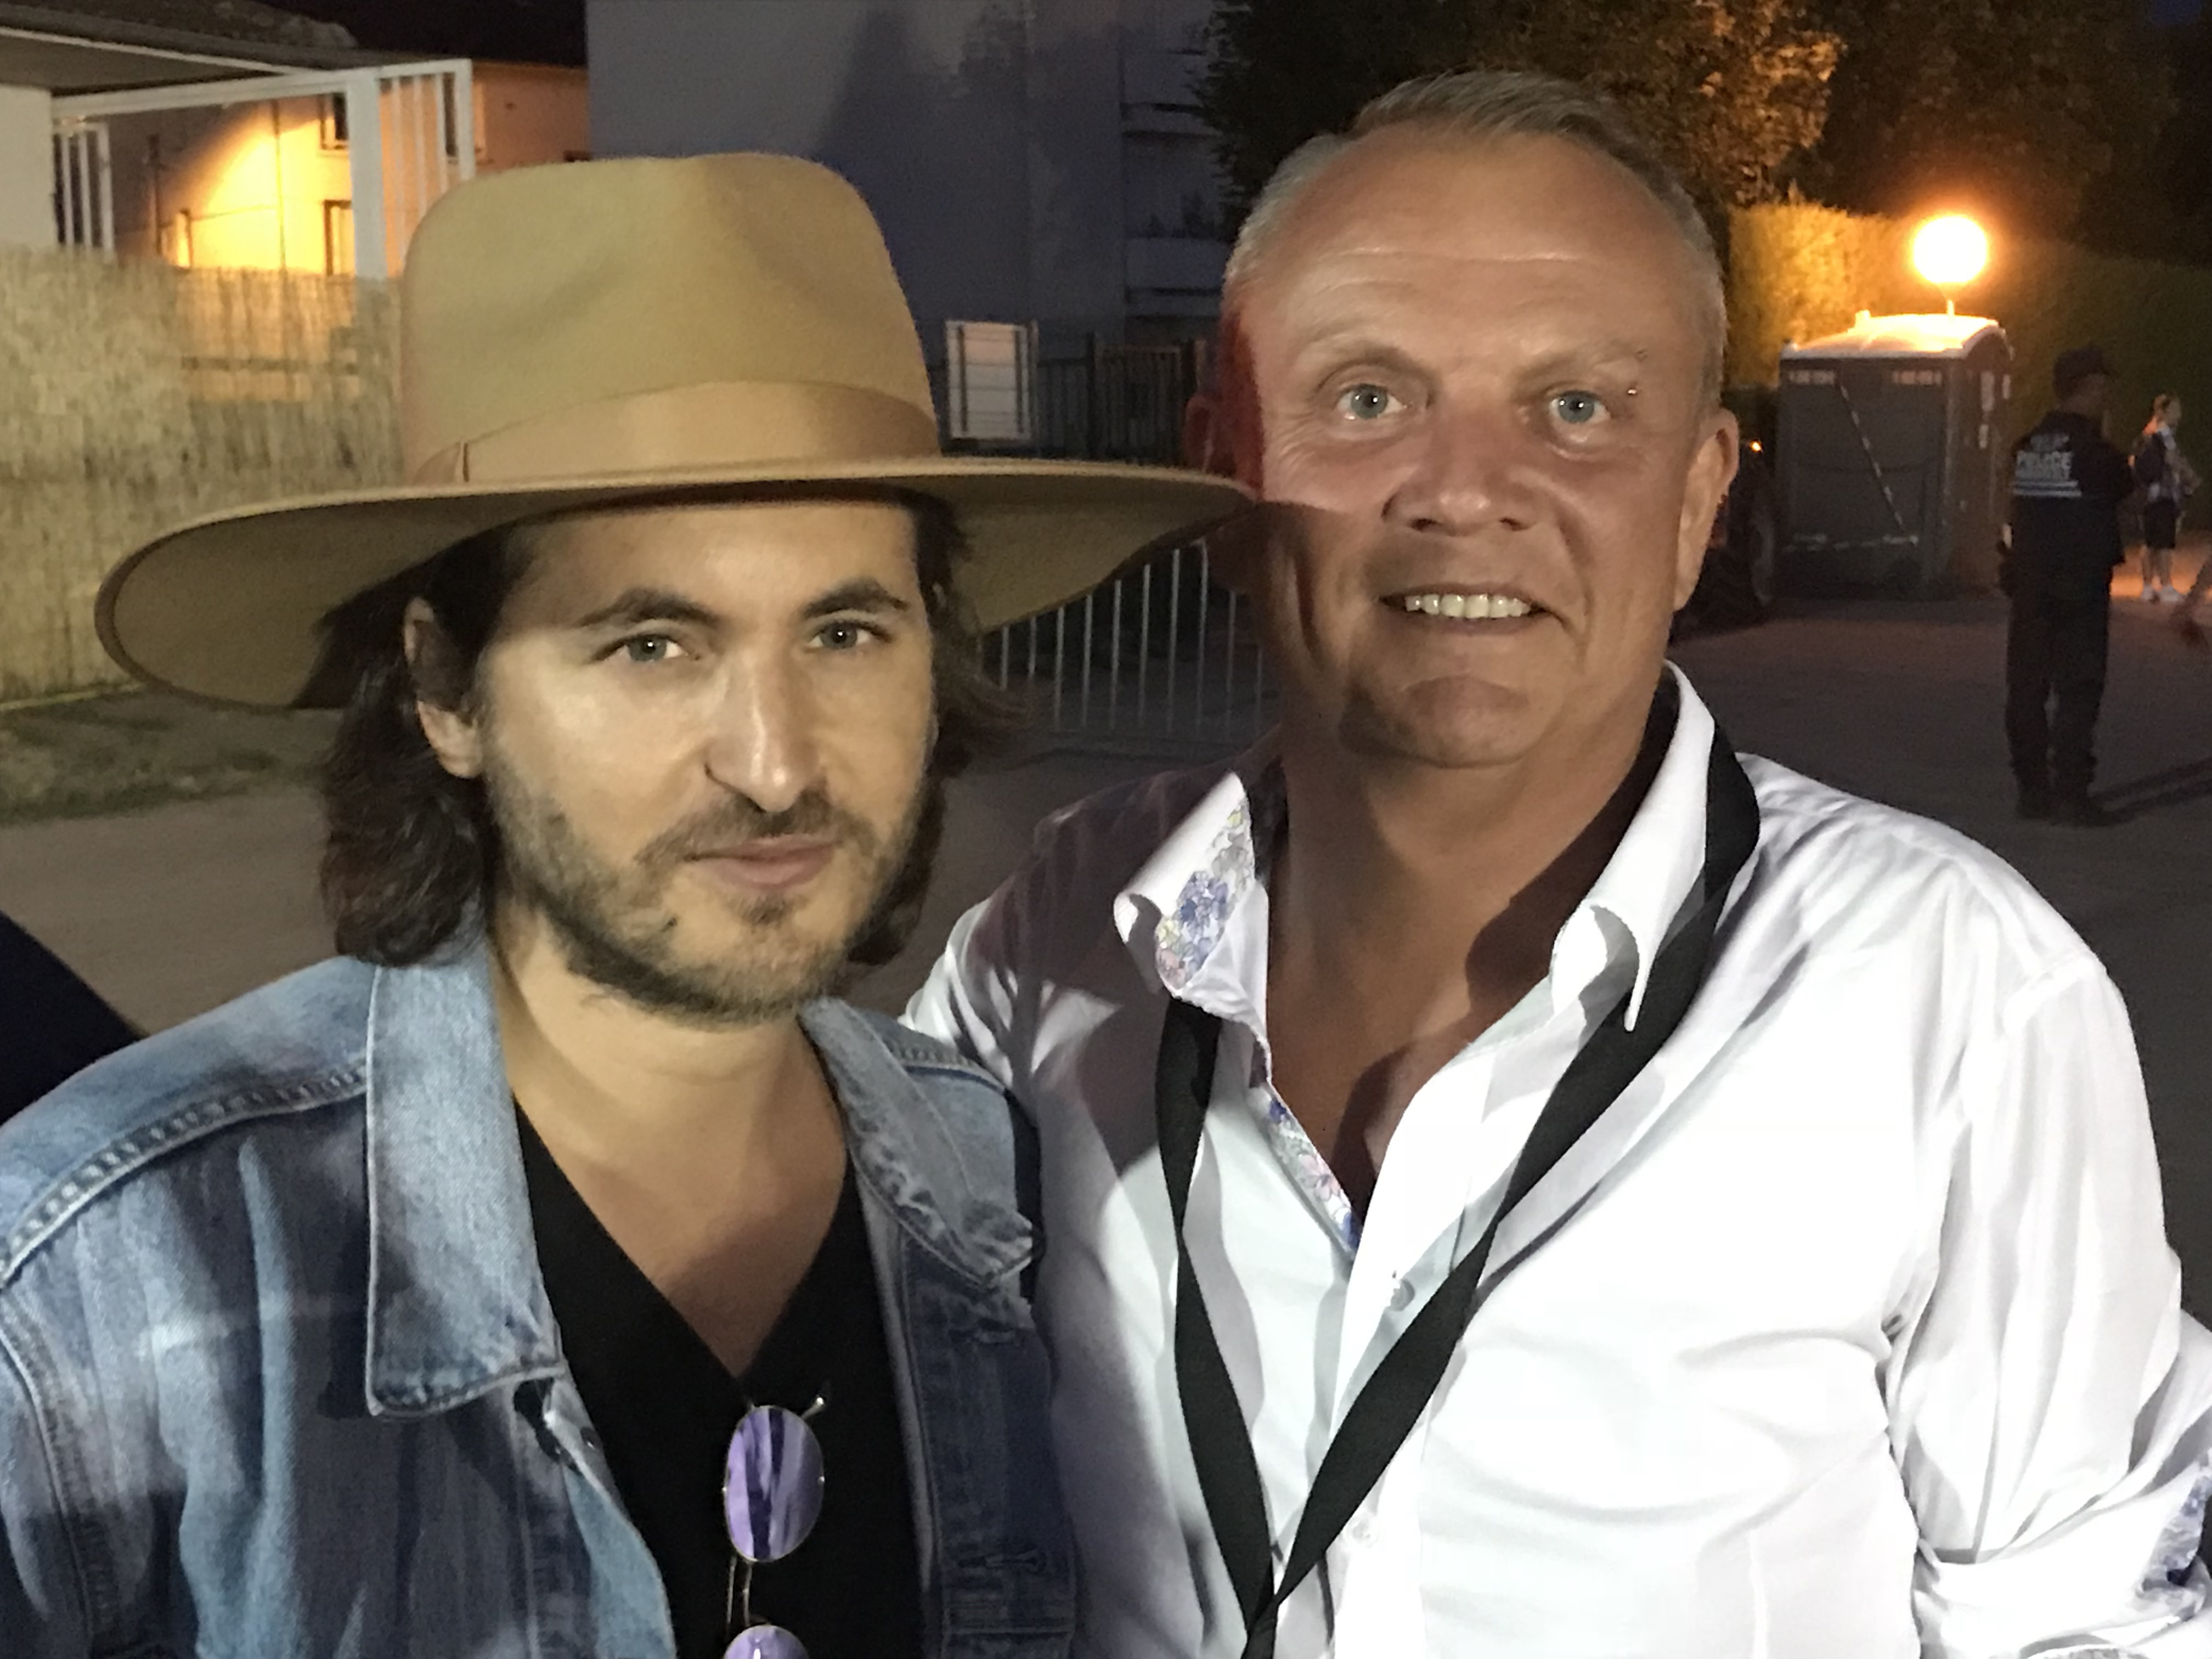 Mickaël Miro avec la casquette TD